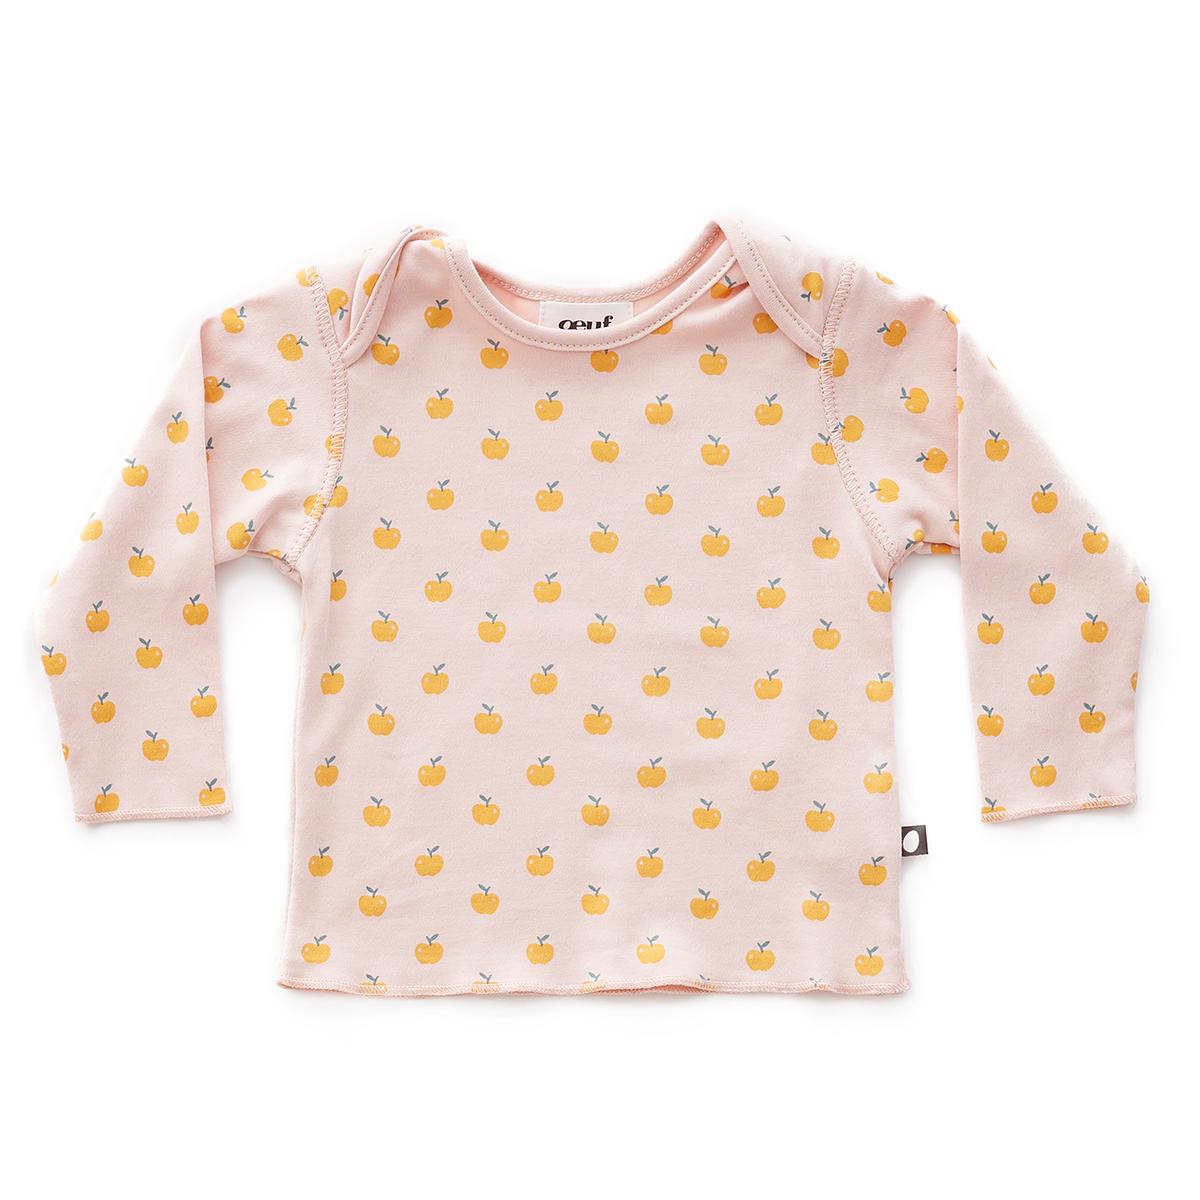 Hauts bébé Tee-shirt Pommes Rose - 12 Mois Tee-shirt Pommes Rose - 12 Mois